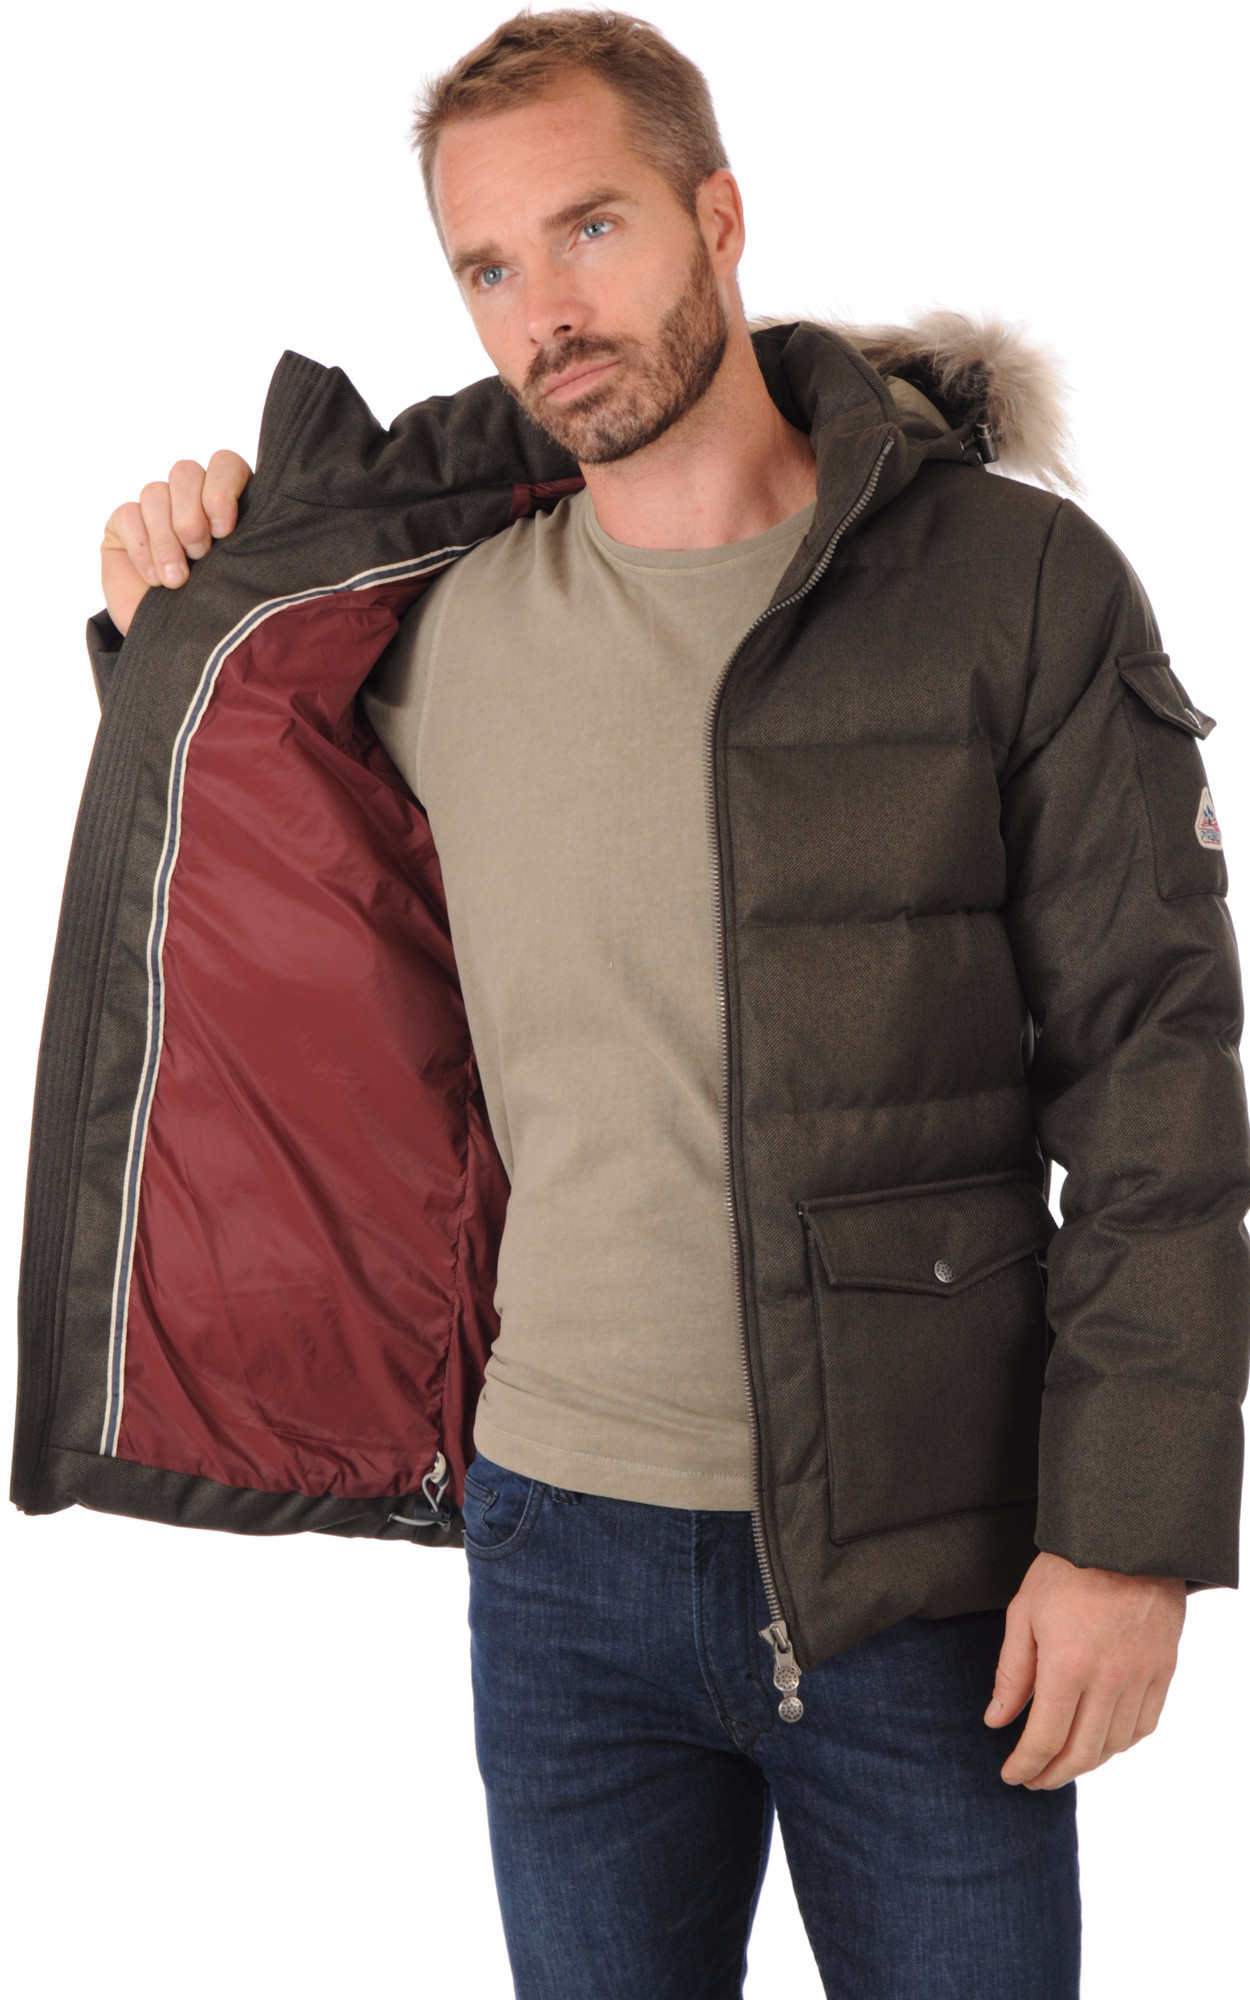 Doudoune Authentic Jacket Drill Kaki Homme